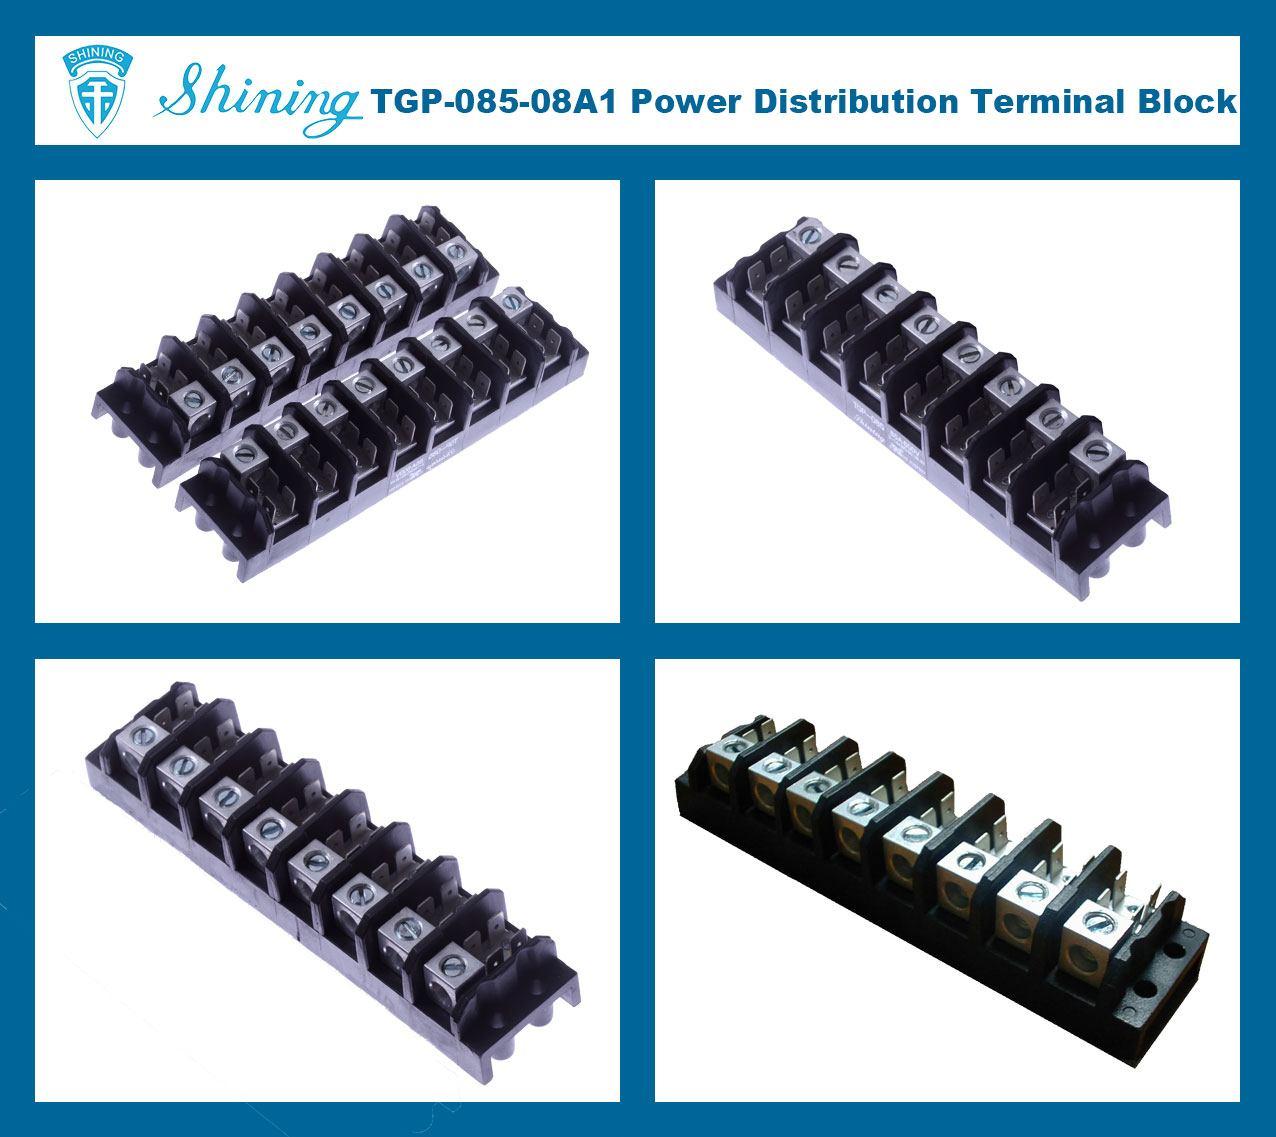 TGP-085-08A1 600V 85A 8 Pole Electrical Power Terminal Block